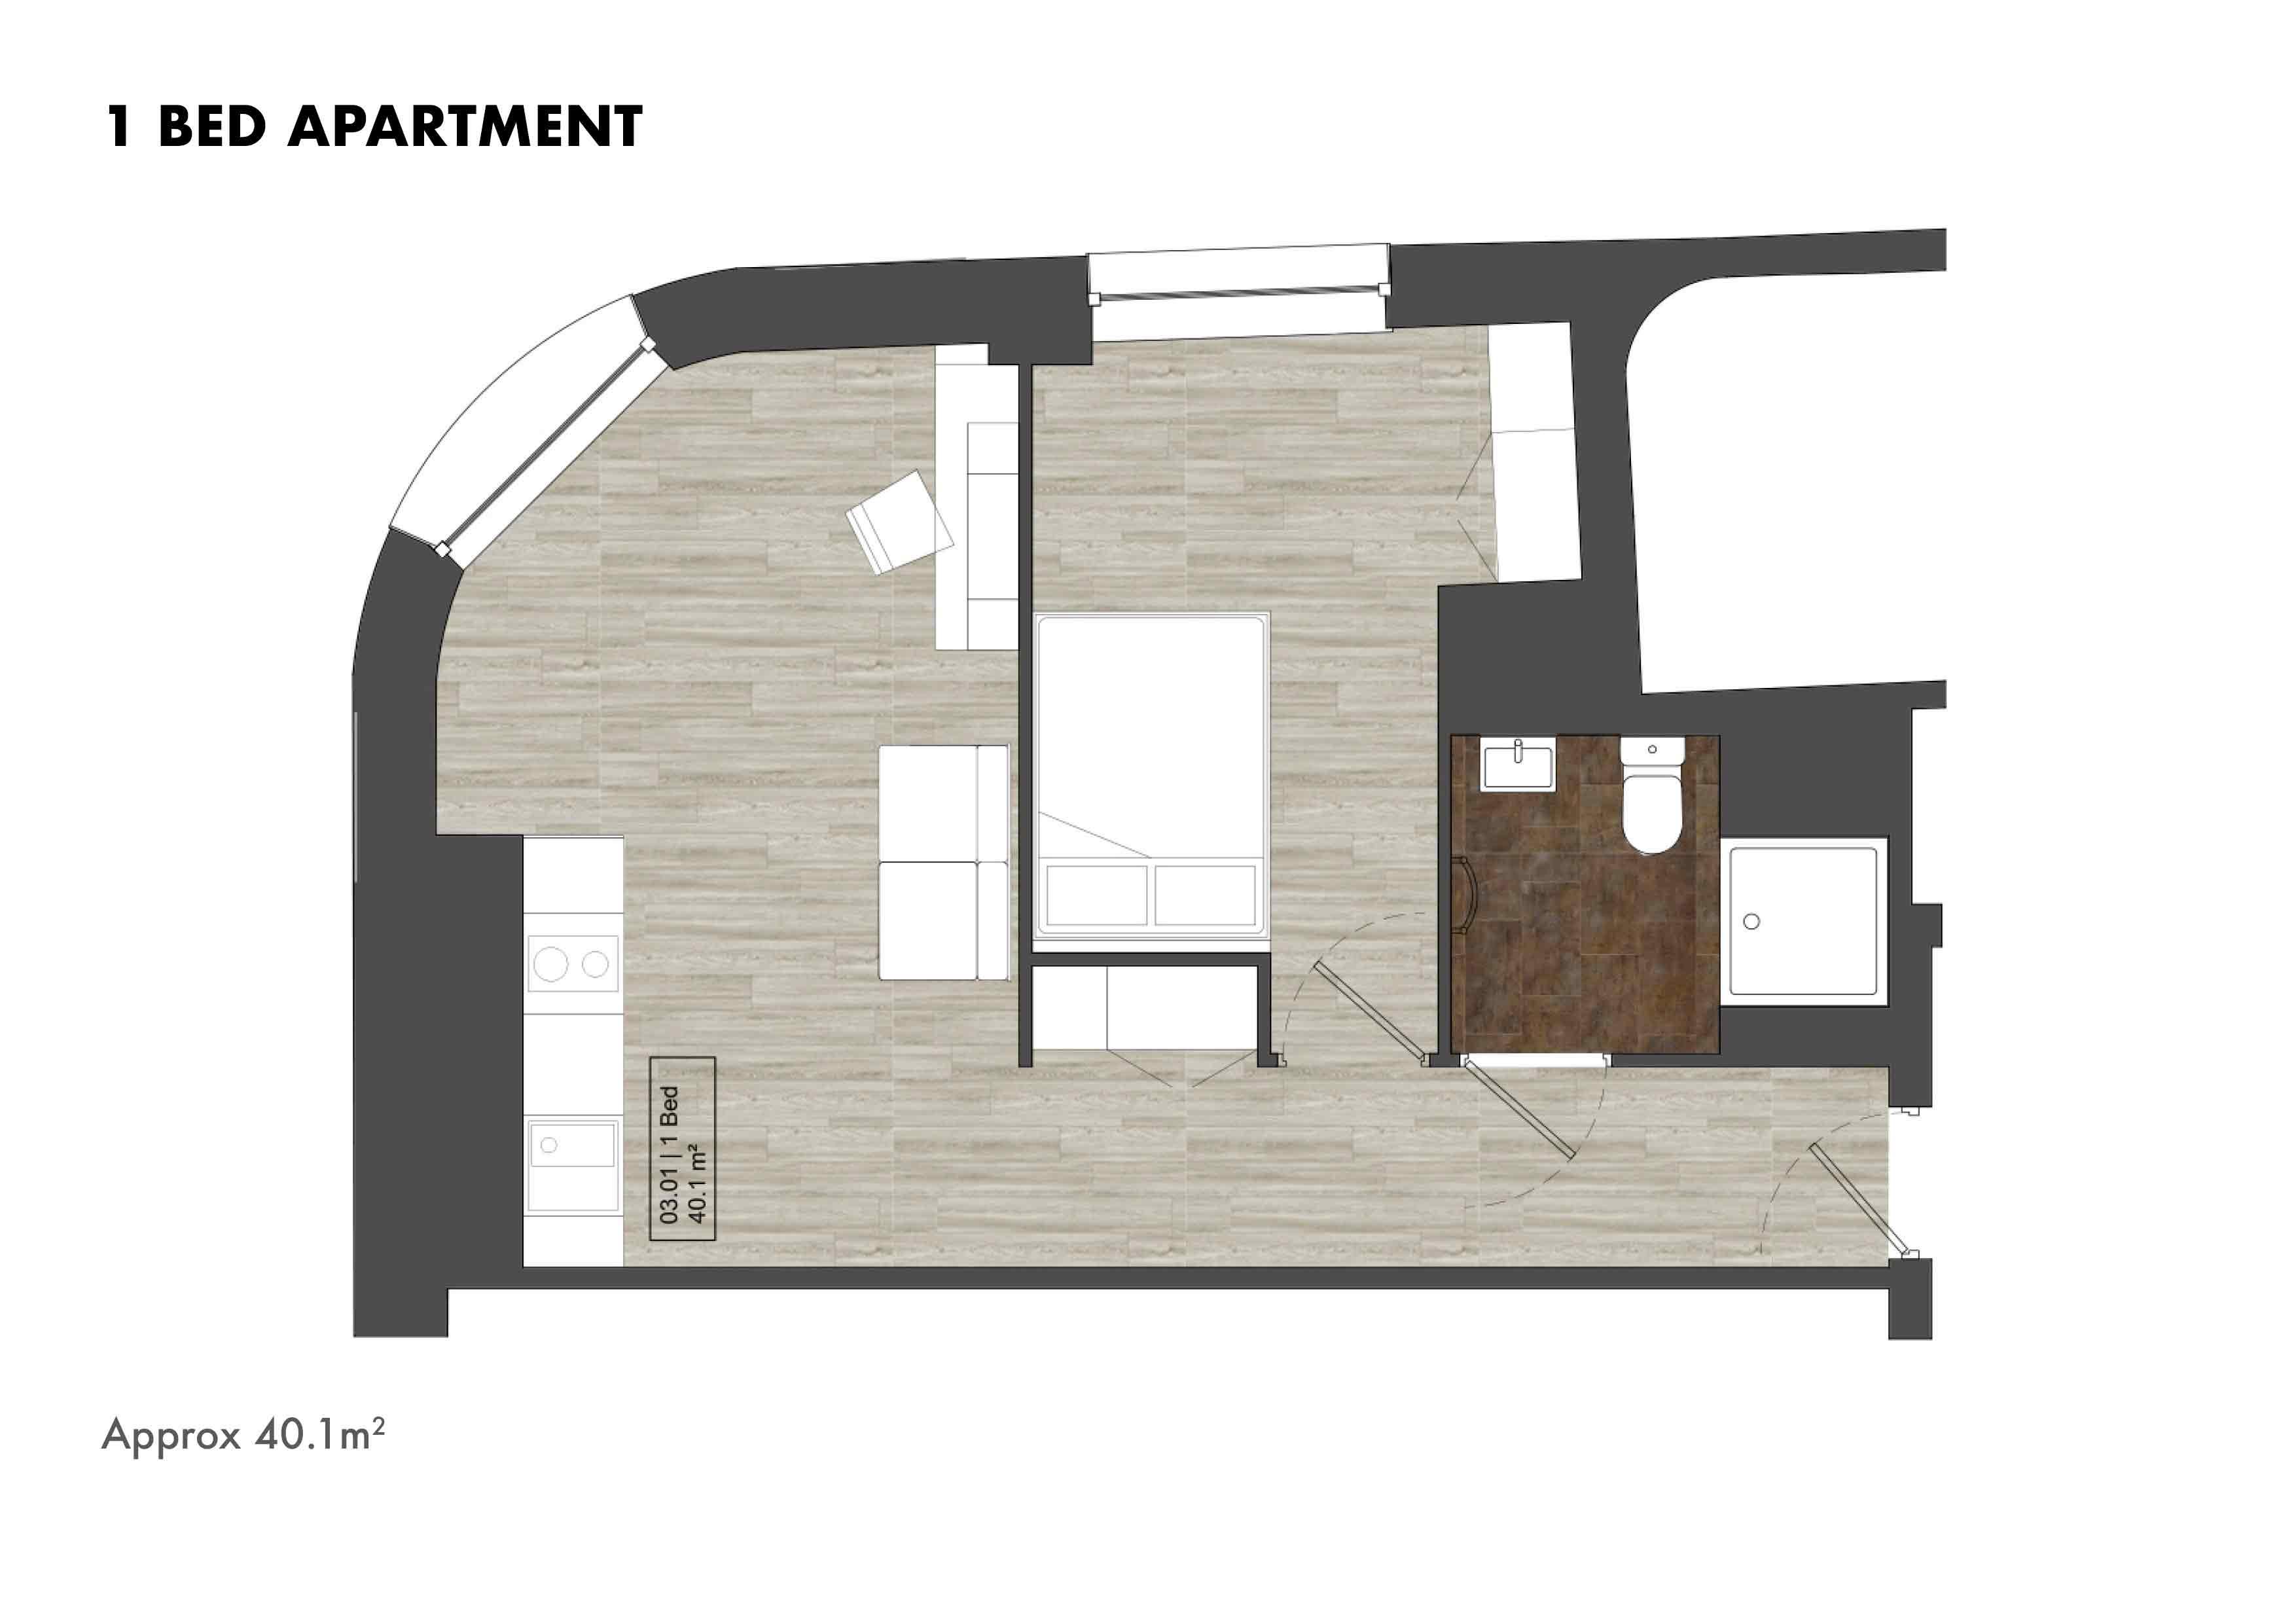 1 Bed Apartment floorplans